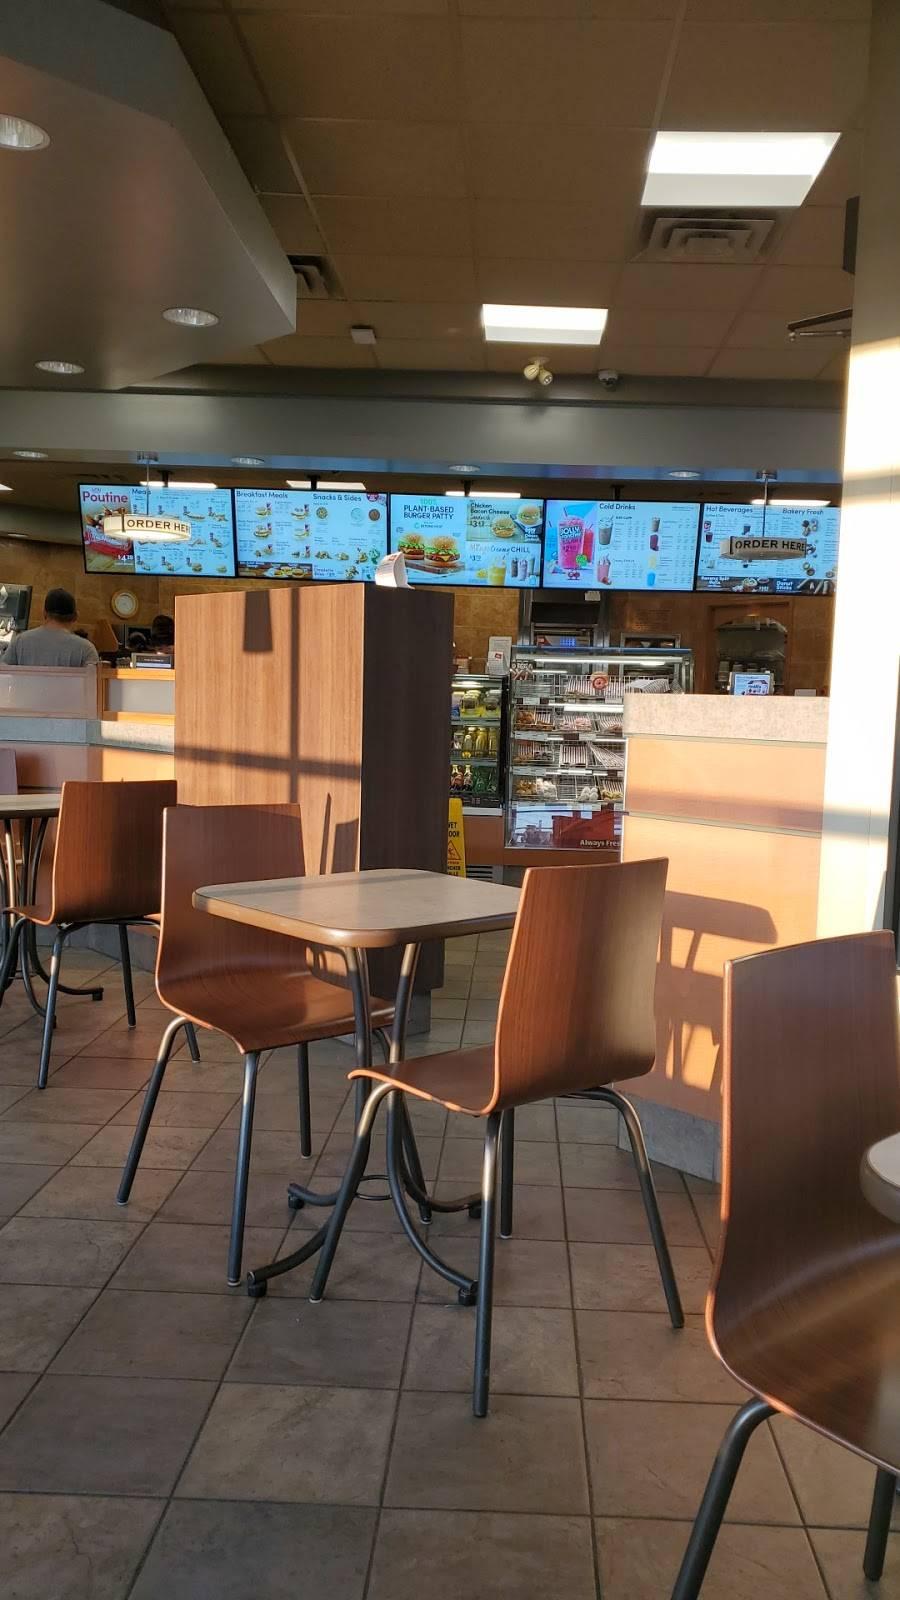 Tim Hortons - restaurant  | Photo 6 of 10 | Address: 5495 Ojibway Pkwy, Windsor, ON N9C 3Y4, Canada | Phone: (519) 972-1867